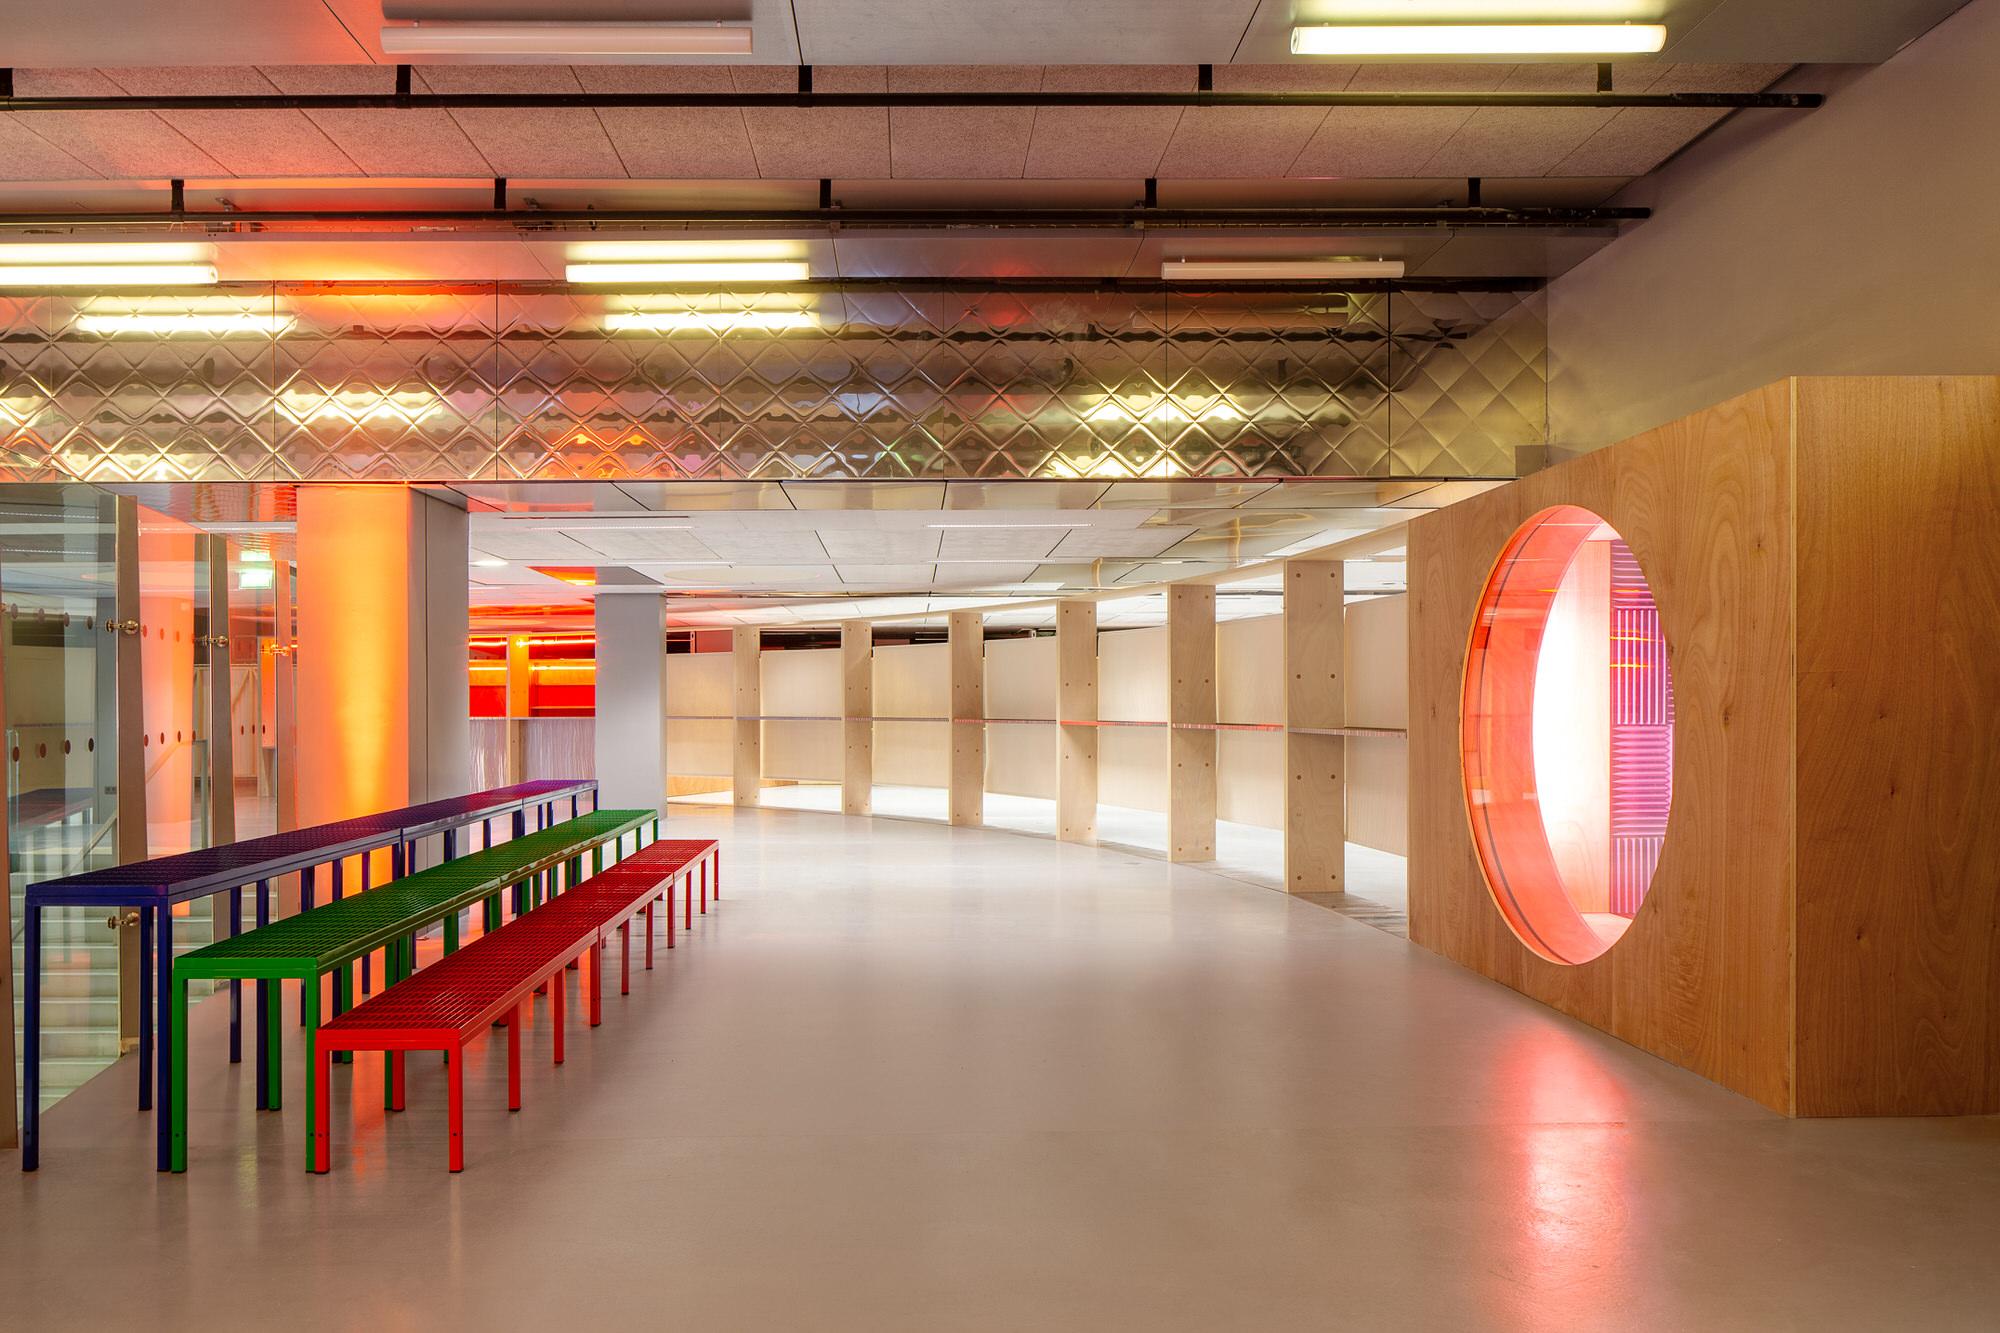 Jean Benoit Vetillard Architecture R+1 Gaite Lyrique Multipurpose Space Paris Photo Giaime Meloni Yellowtrace 01